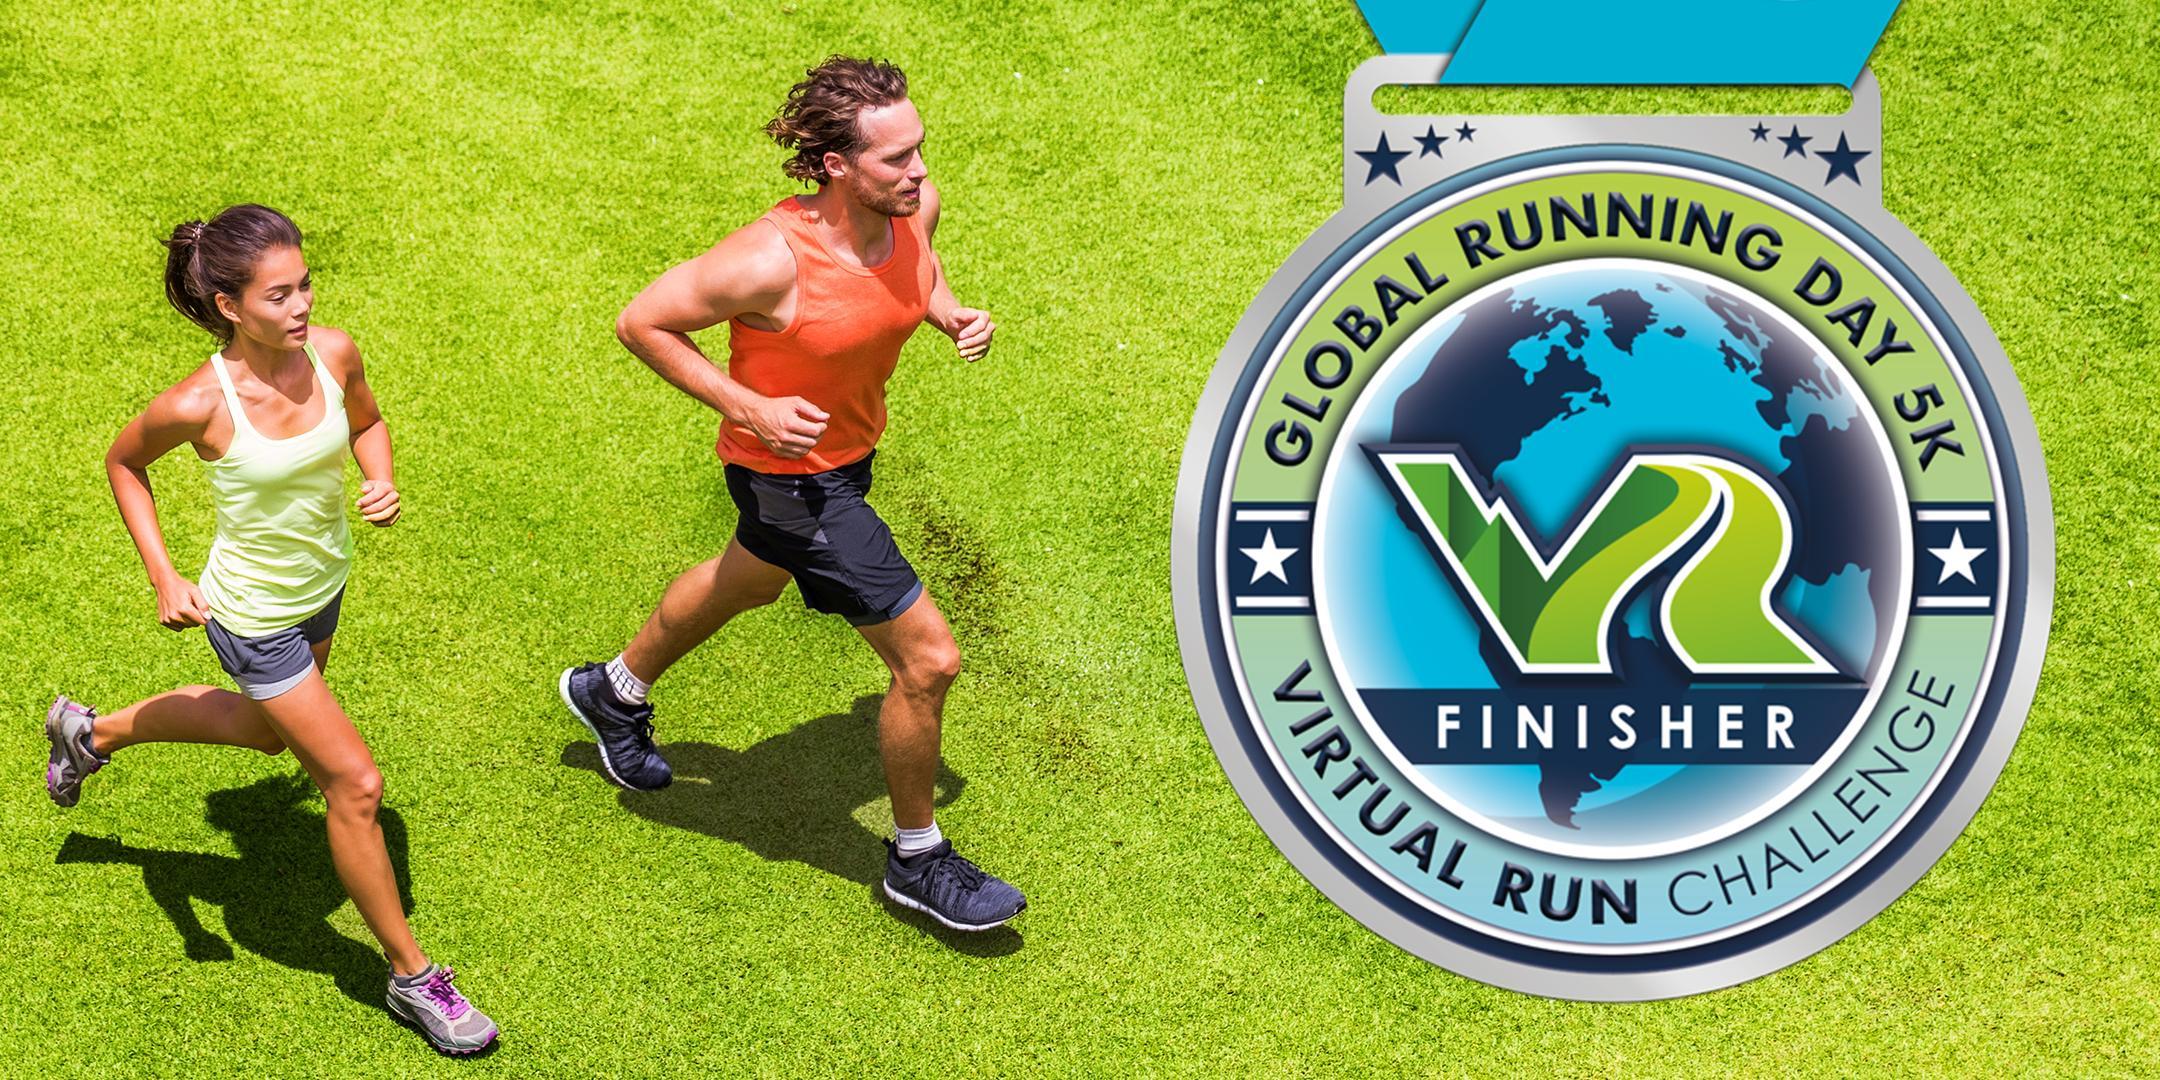 2020 Global Running Day Free Virtual 5k - McAllen